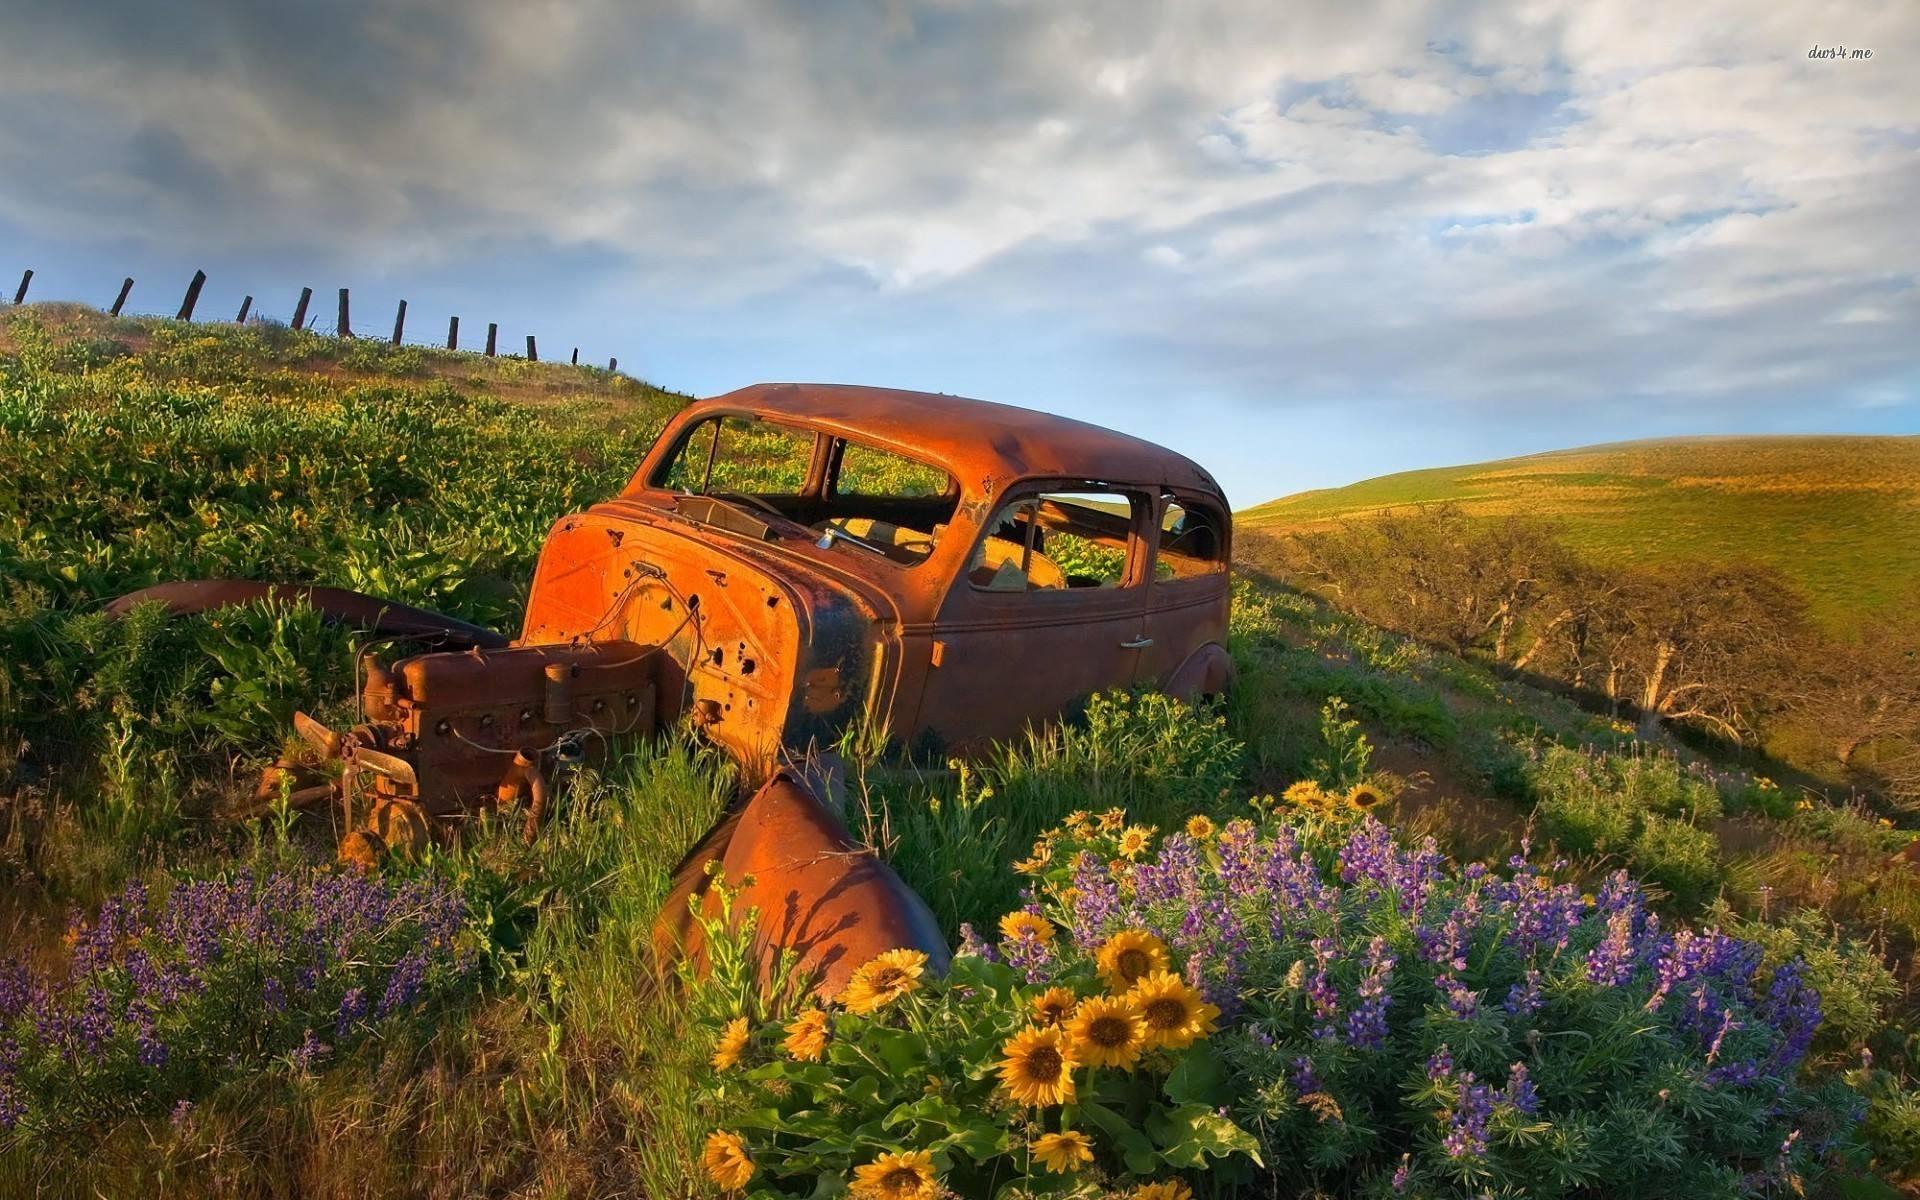 Chevy-2-1040